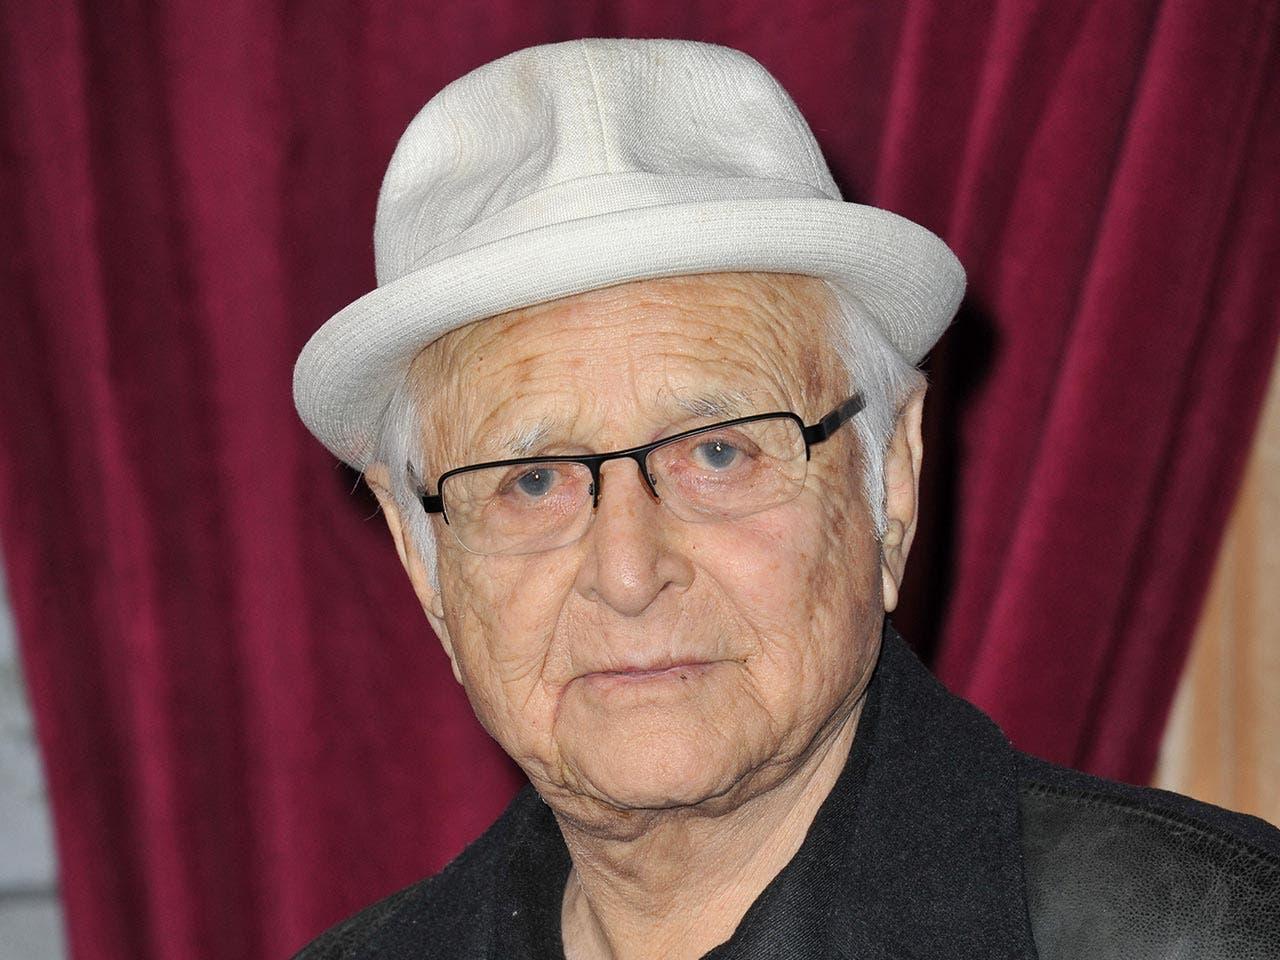 Norman Lear | Featureflash Photo Agency/Shutterstock.com